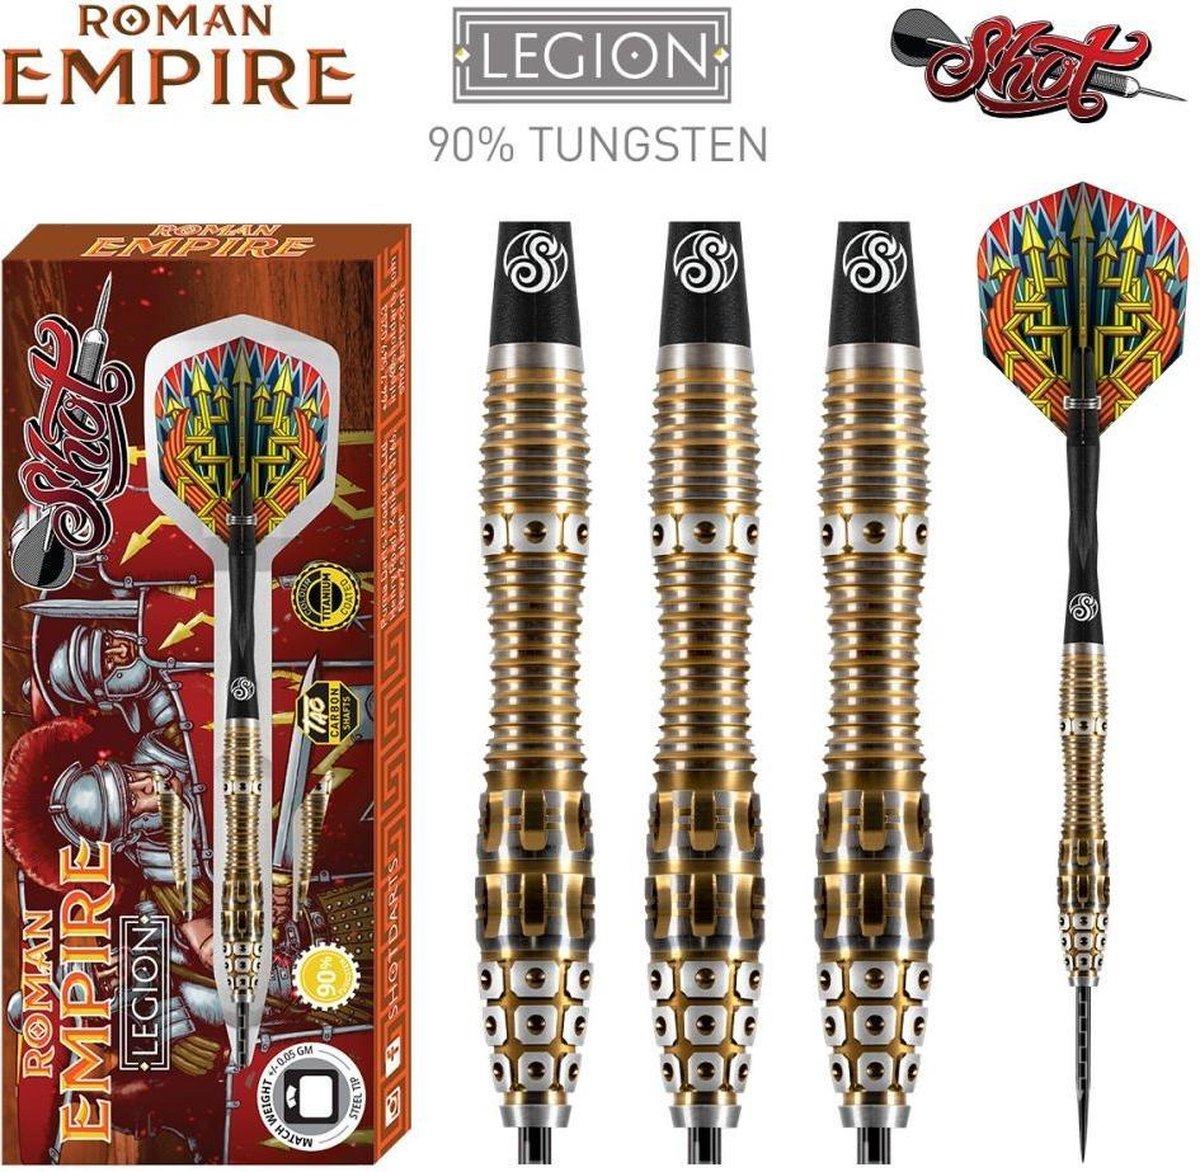 Shot Roman Empire Legion 90% - 25 Gram